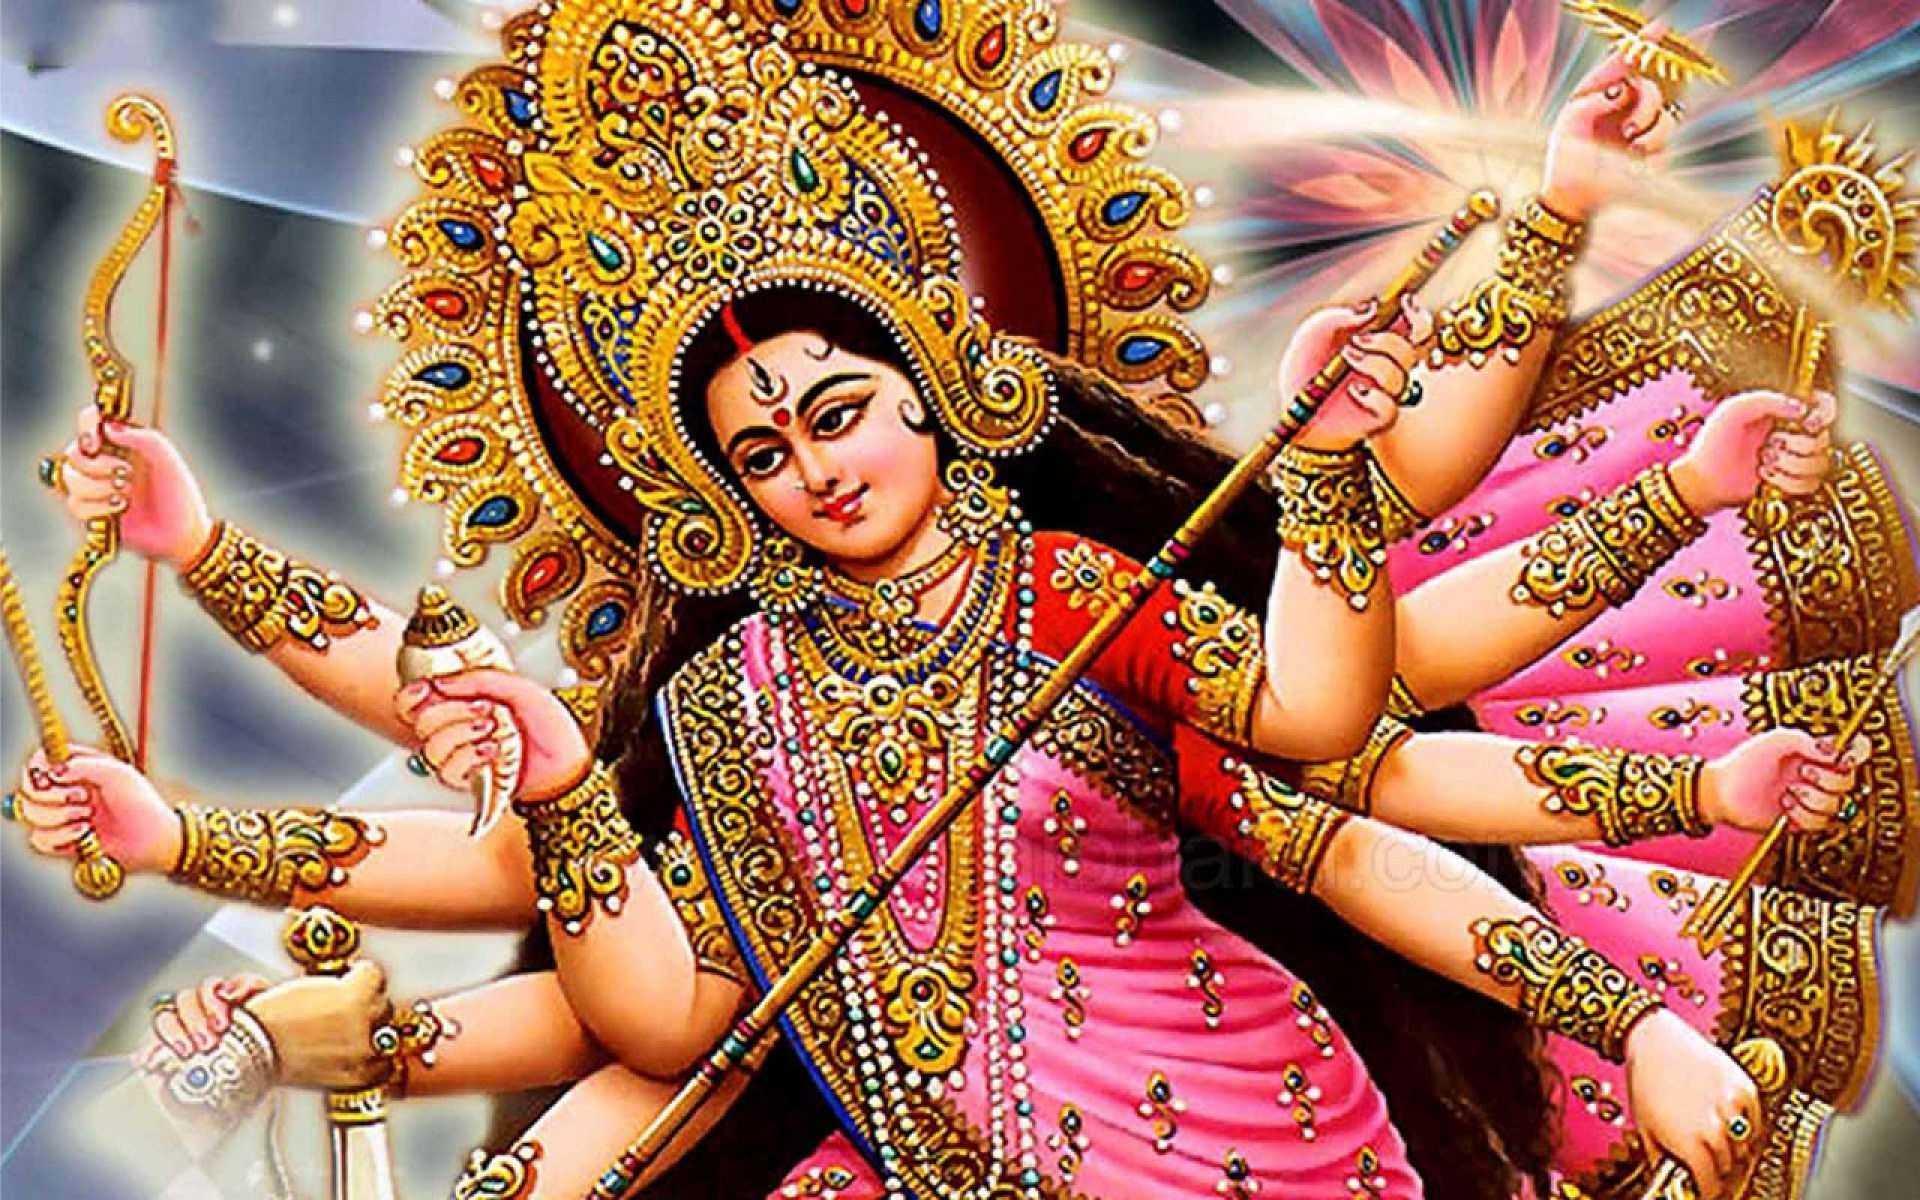 Durga Mata Navdurga Images Meri Mata - Mata Durga Navdurga Images Wallpaper. Jai Maa Durga Durga Devi Maiya Ji Wallpaper. Navratri Navdurga Mata Ji Wallpaper